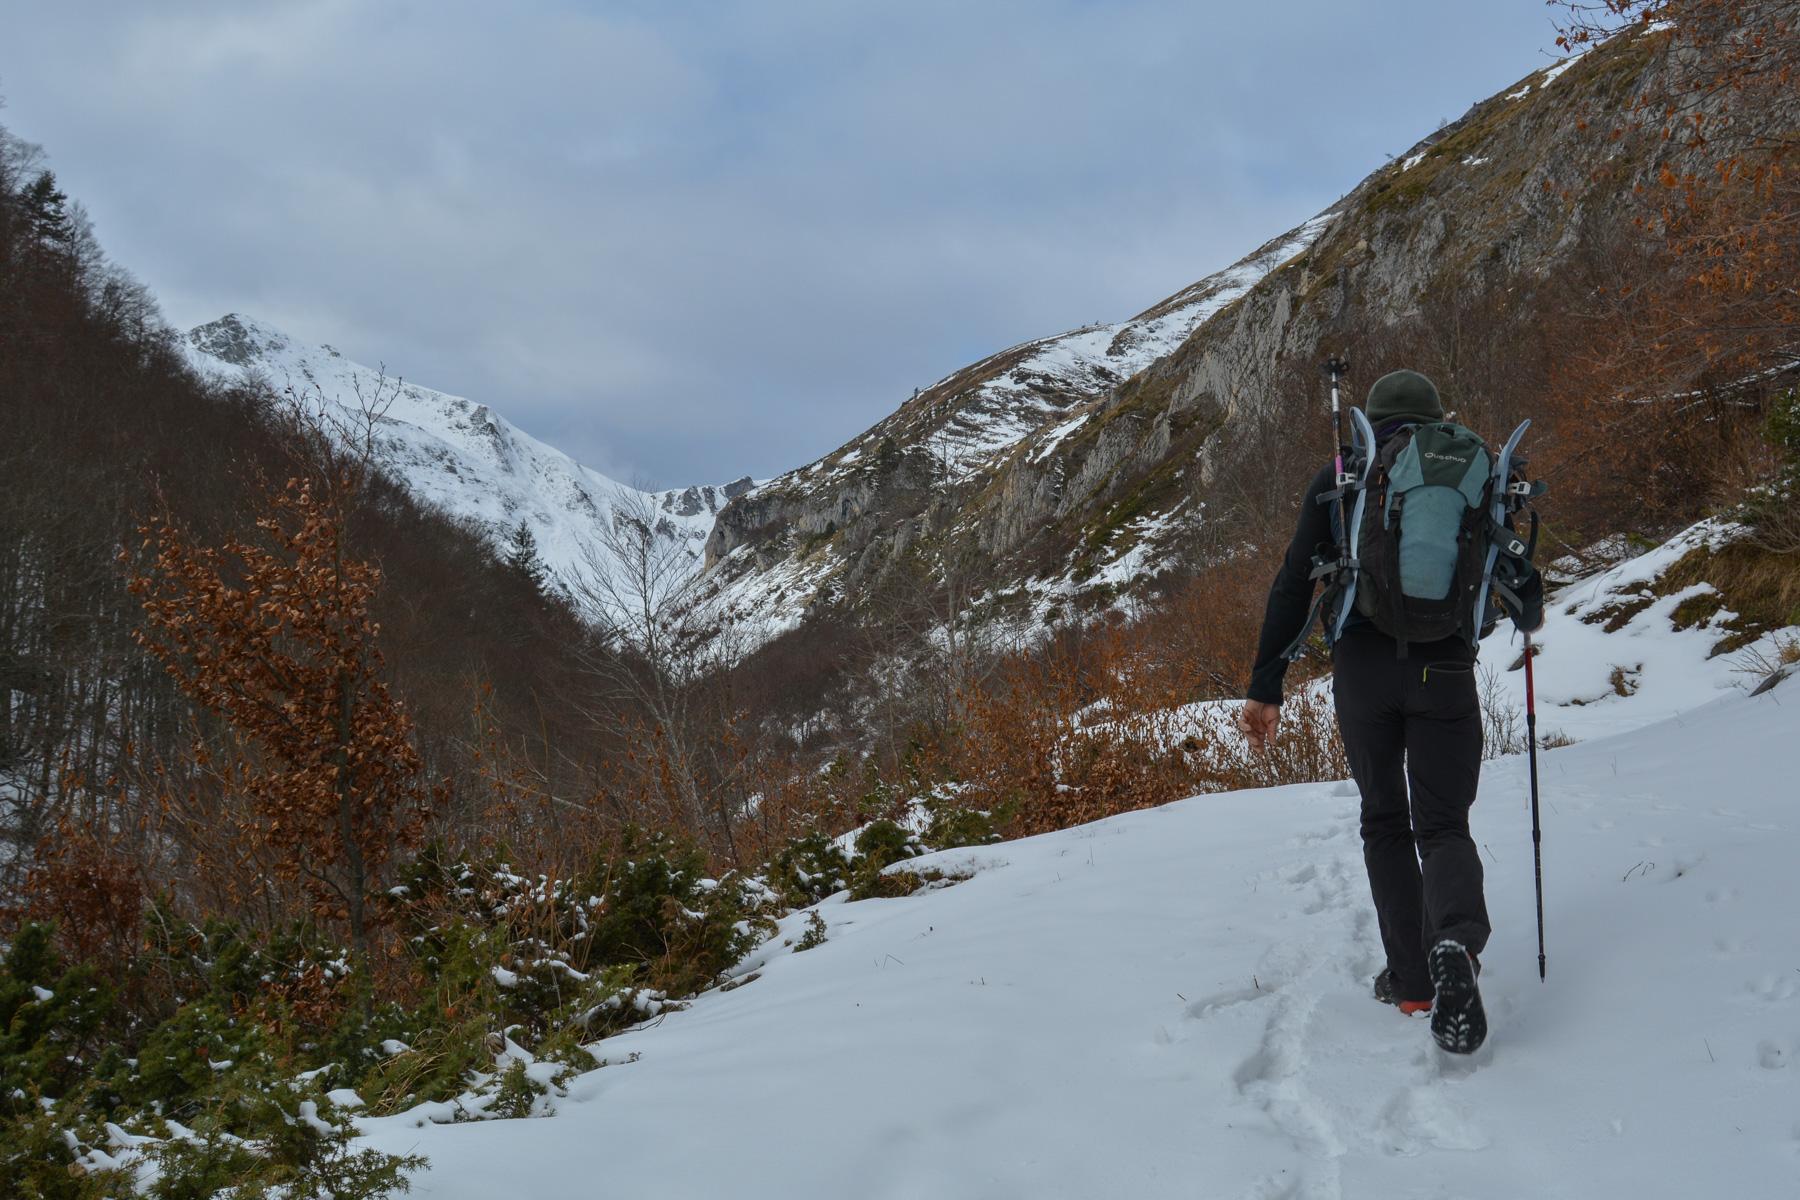 Ariège sous la neige, enfin ! 4